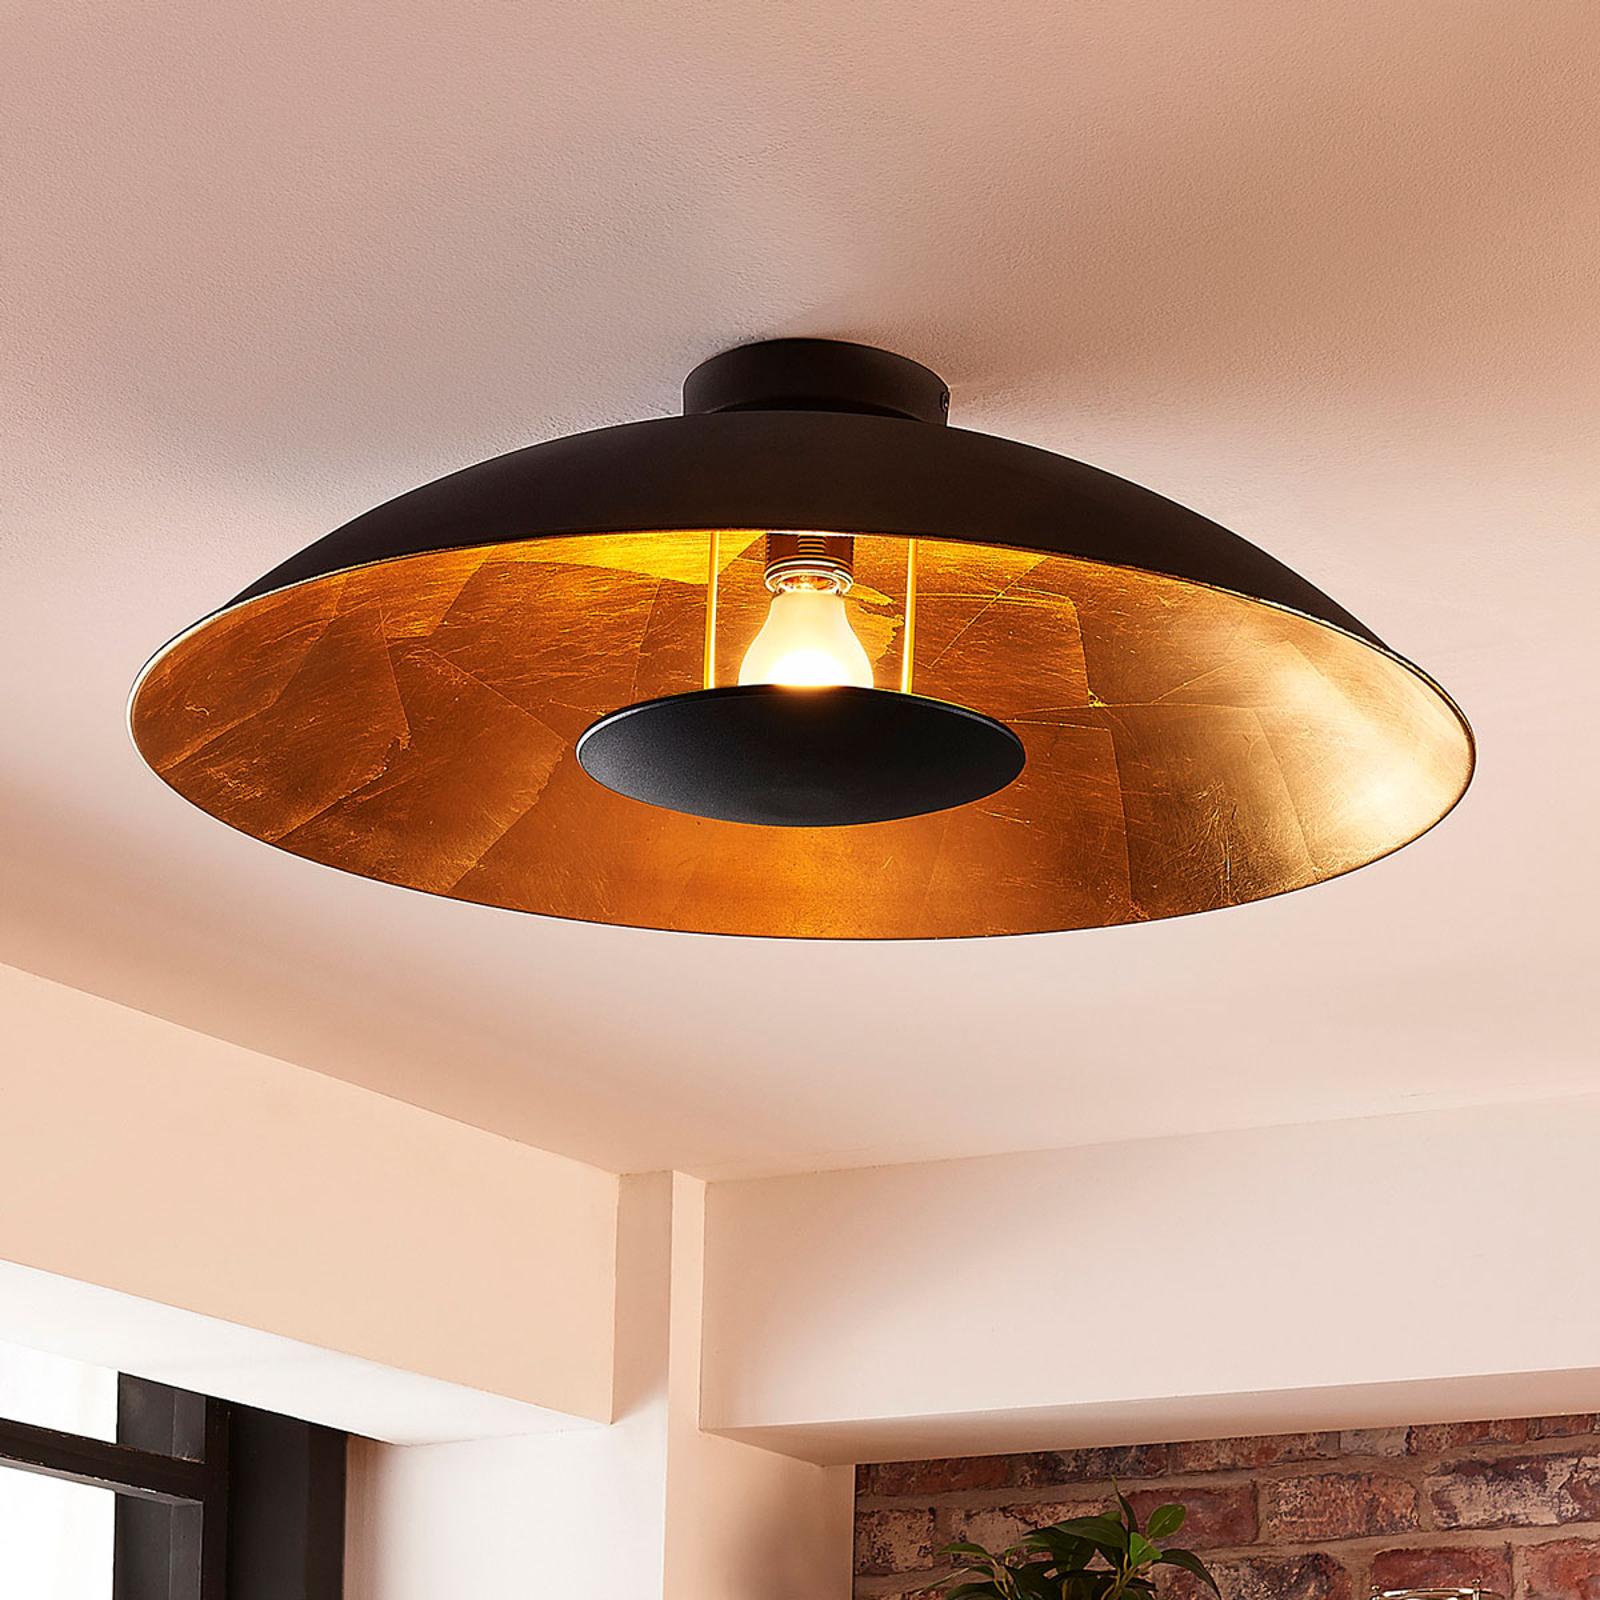 Zwart-gouden plafondlamp Emilienne